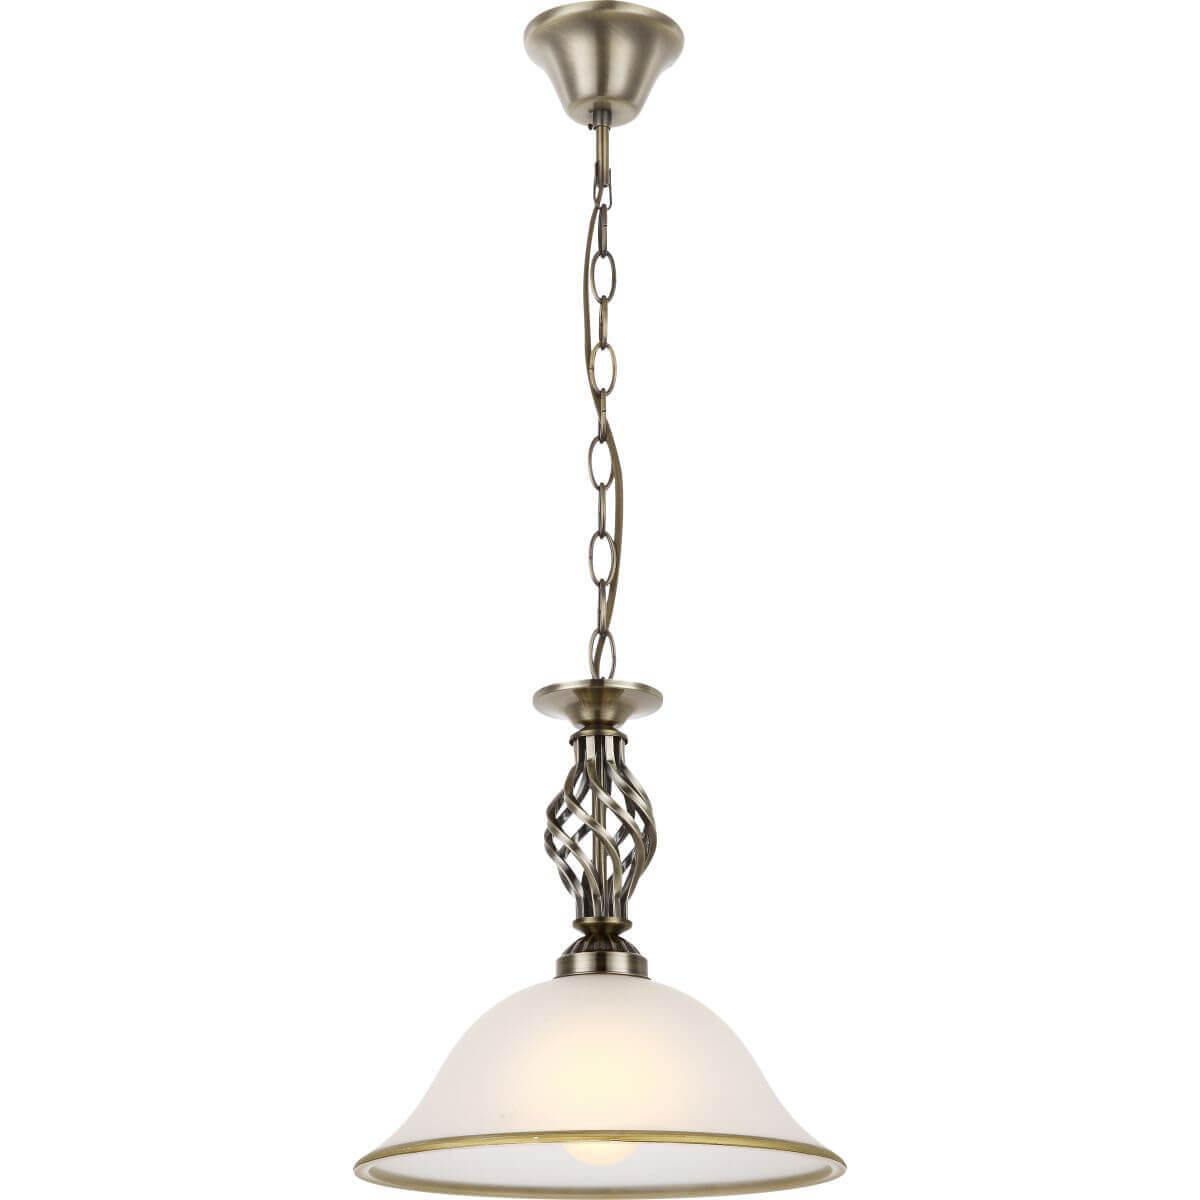 Светильник Globo 60208H Odin подвесной светильник globo new 6905 3 бронза